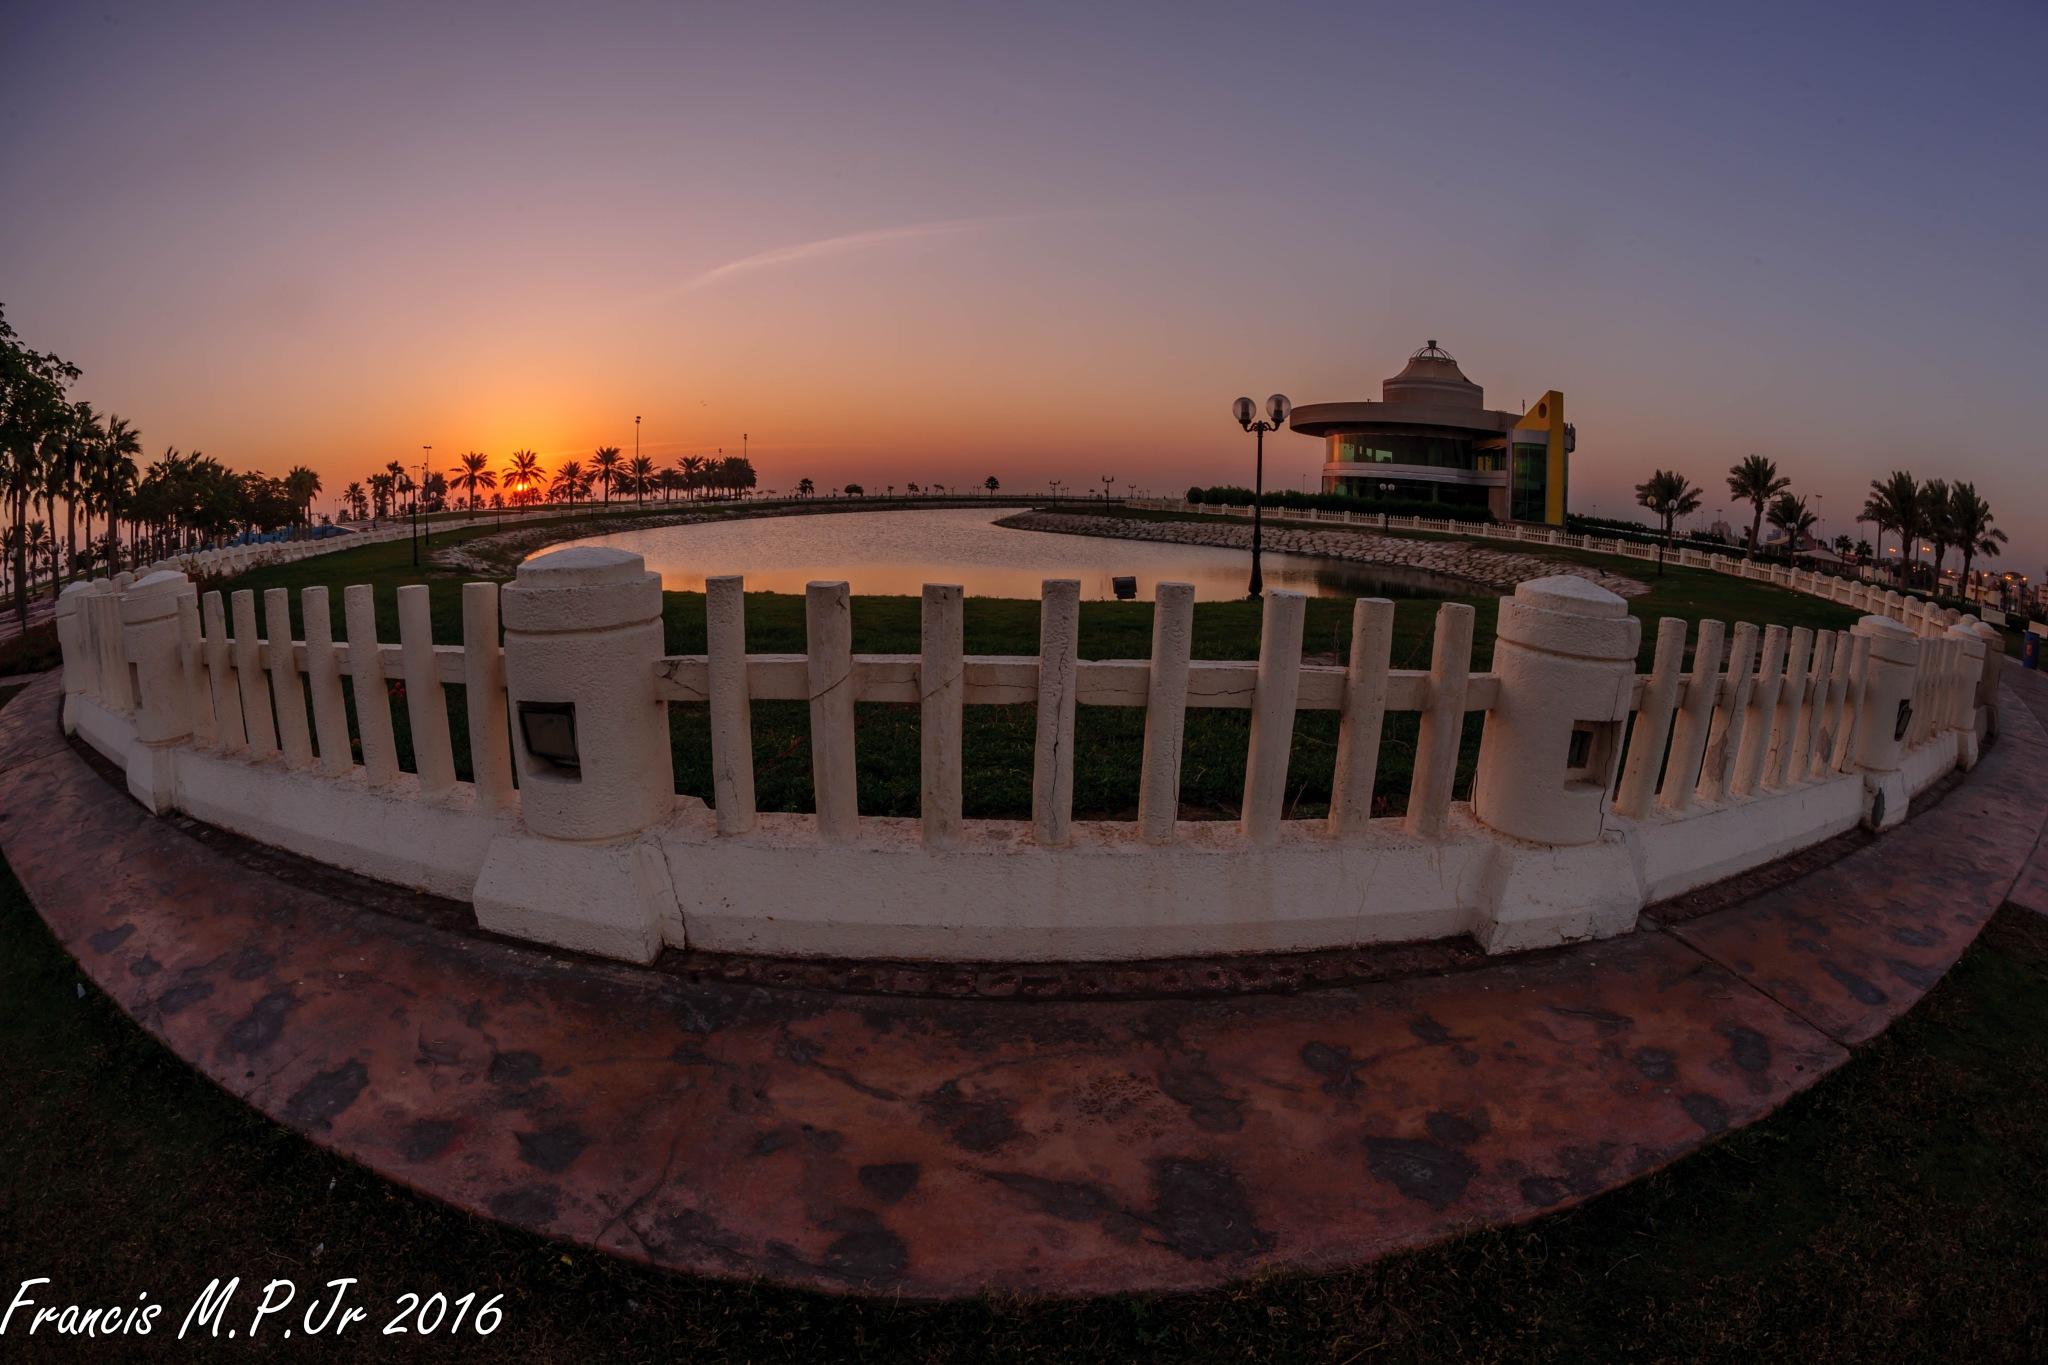 Sunrise in Khobar by Francisco M Pastoril Jr